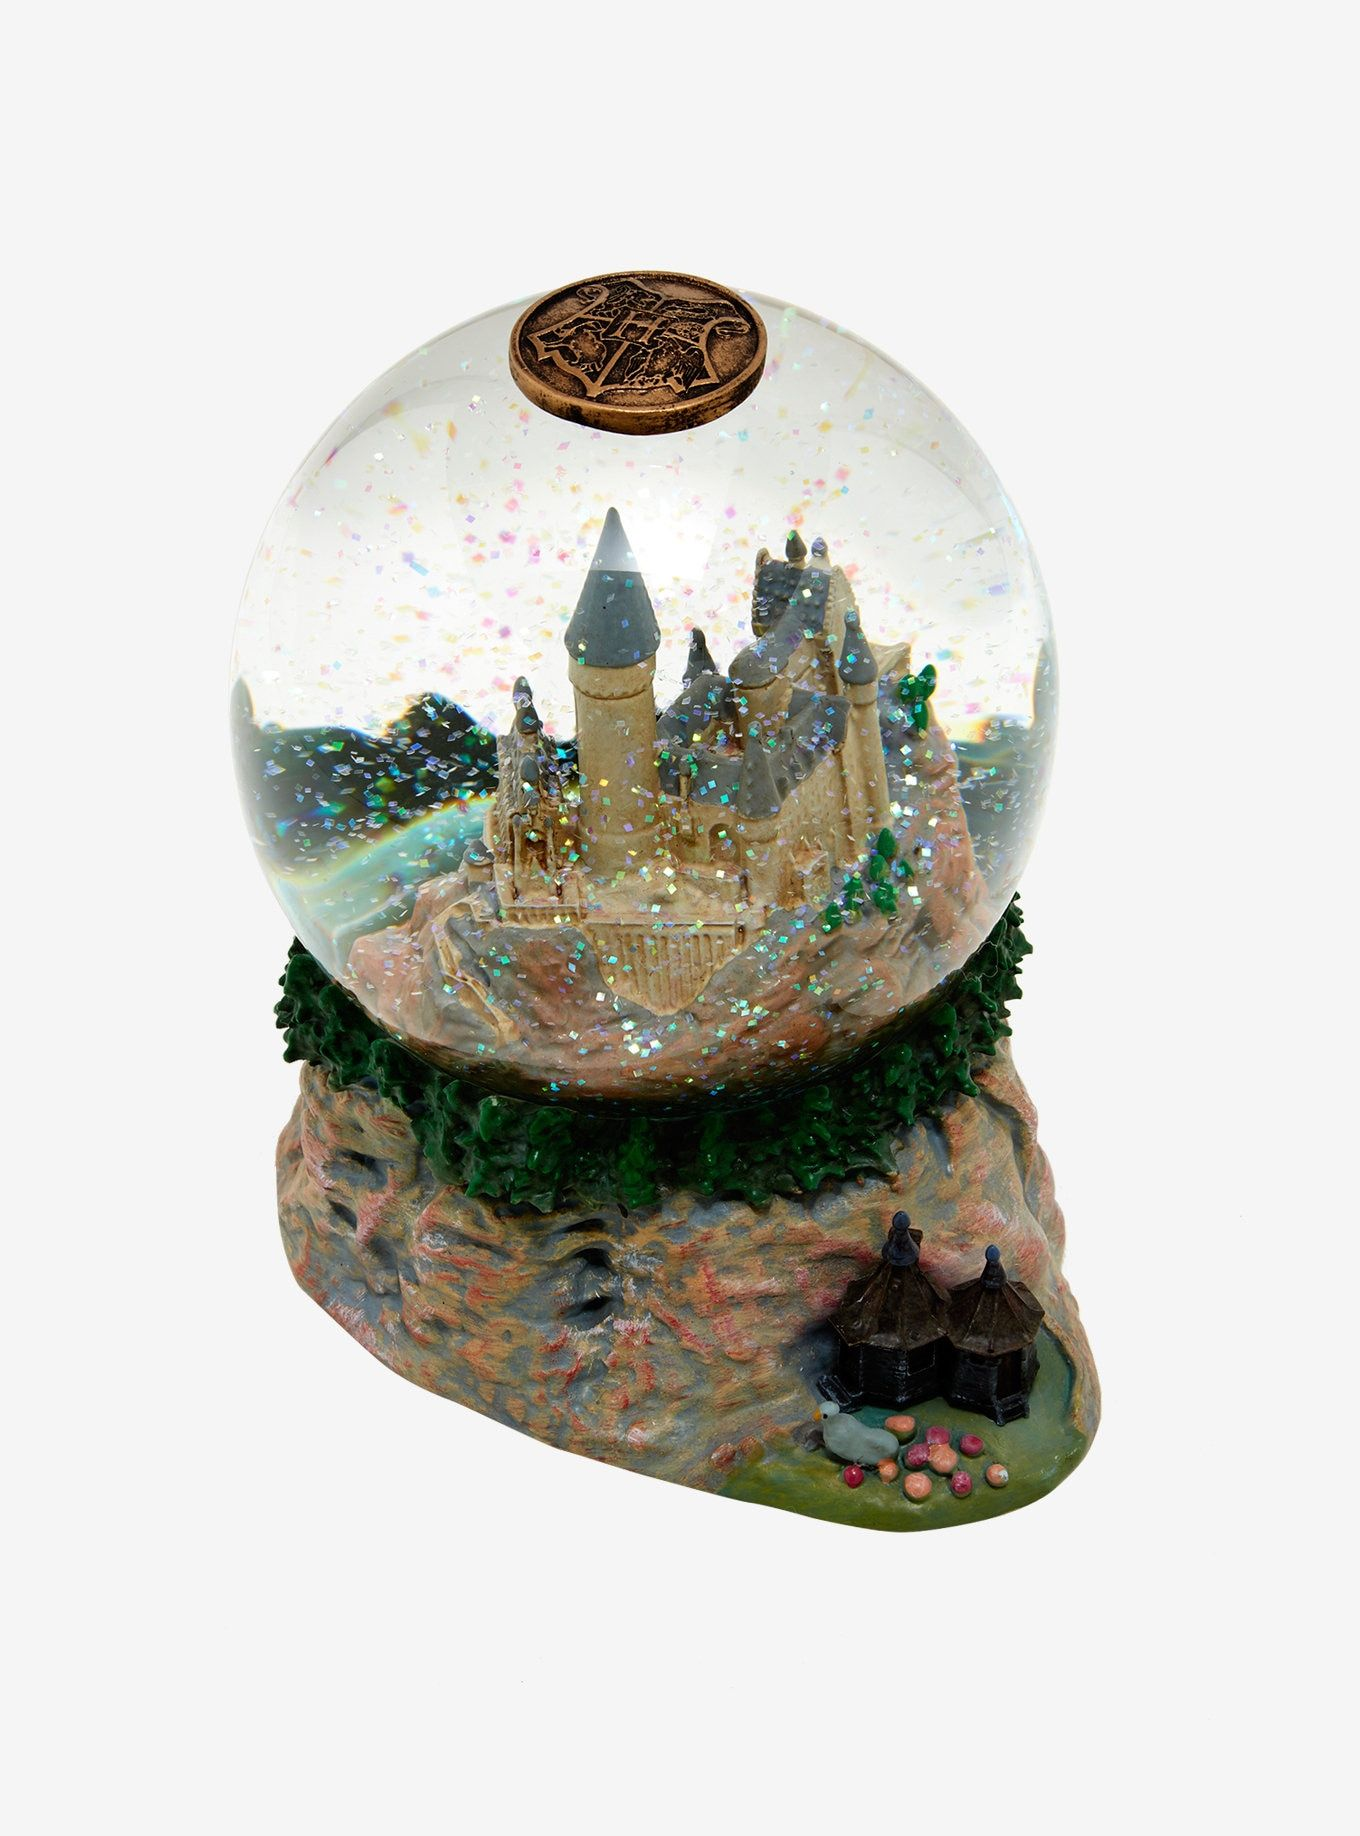 Harry Potter Hogwarts Castle Snow Globe Snow Globes Harry Potter Hogwarts Castle Harry Potter Snow Globe